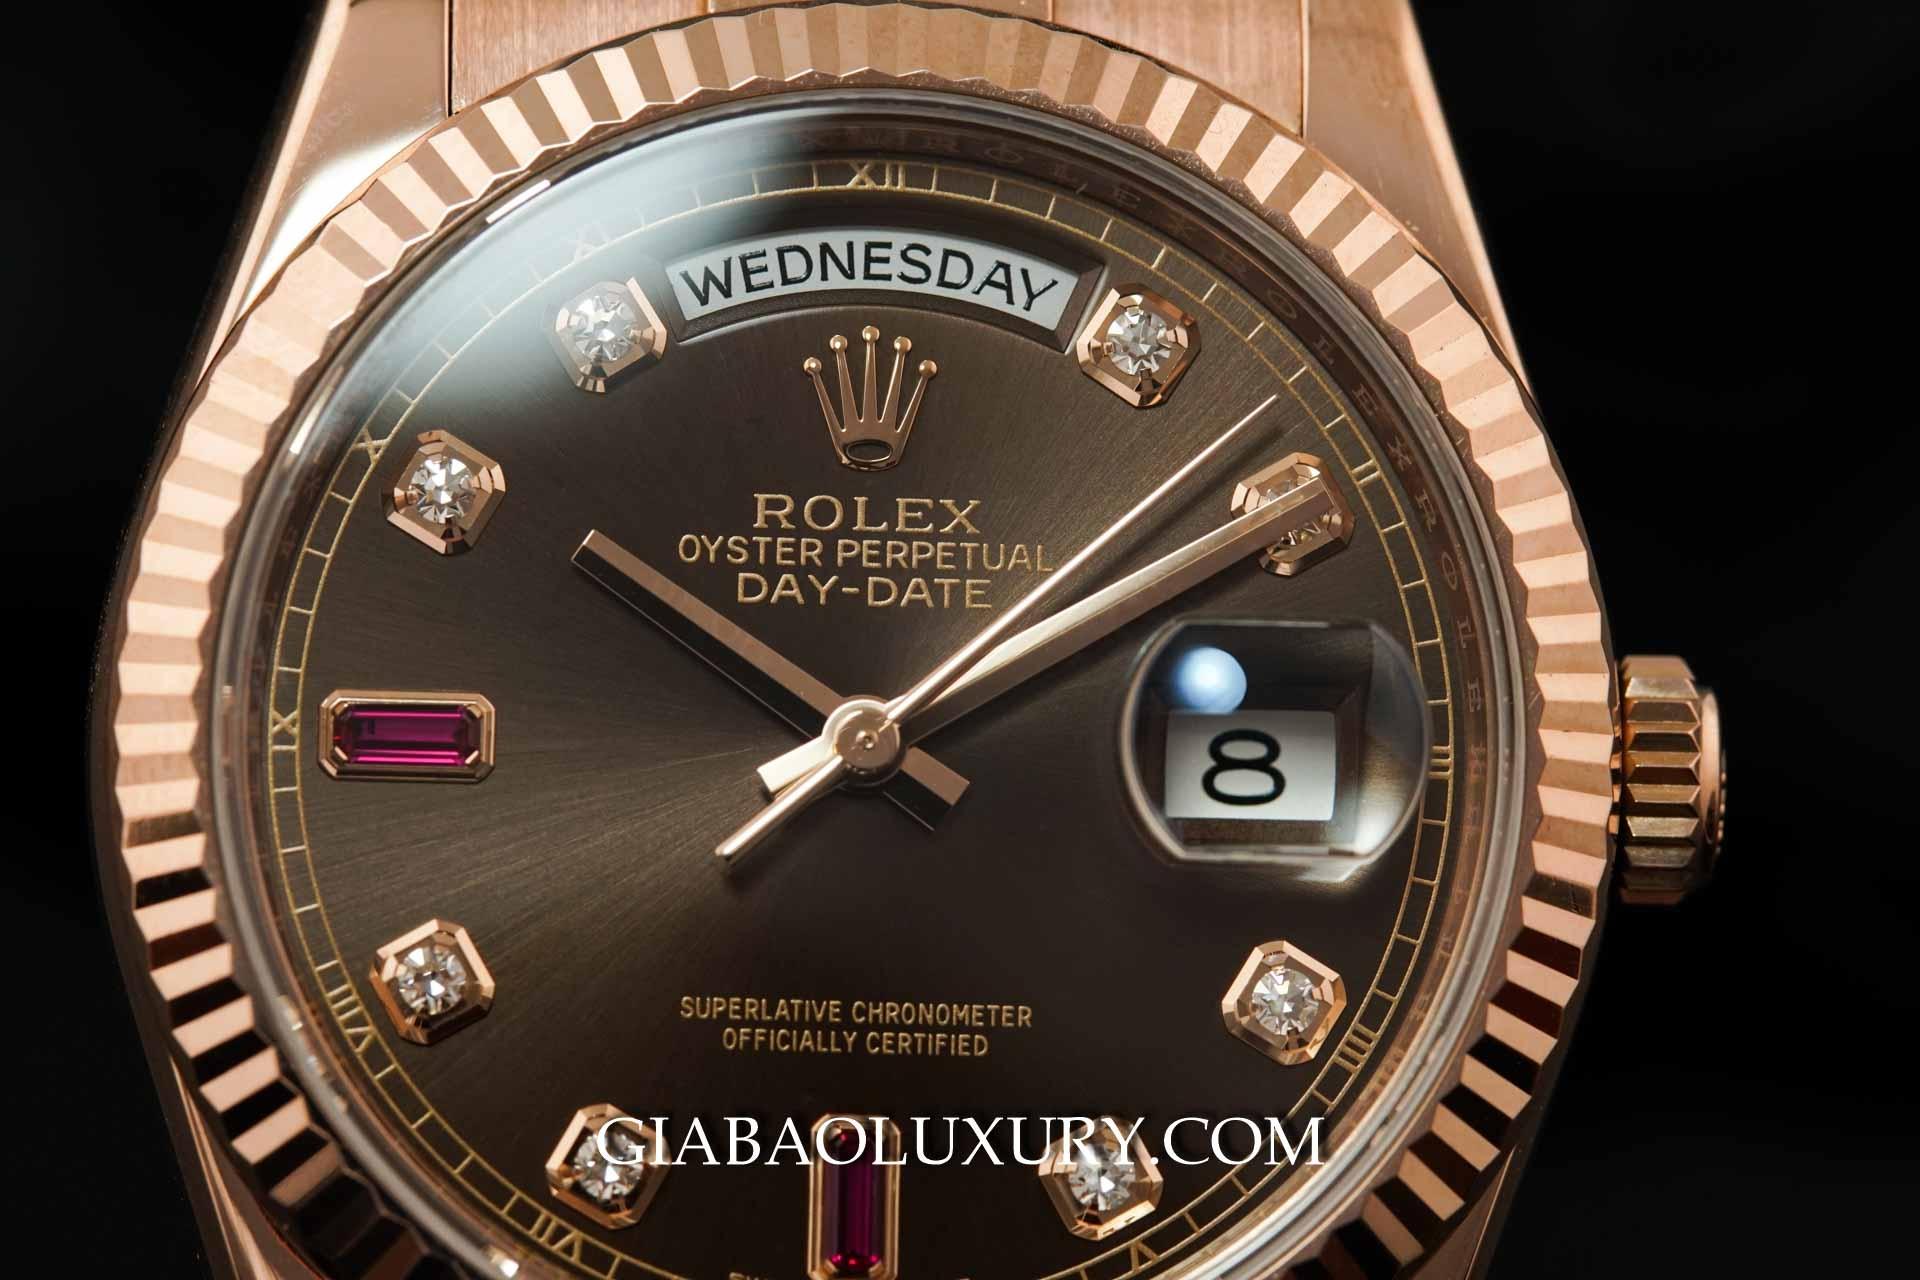 Đồng hồ Rolex Day-Date 118235 Mặt Số Chocolate Đá Ruby Đỏ Dây Đeo Oyster